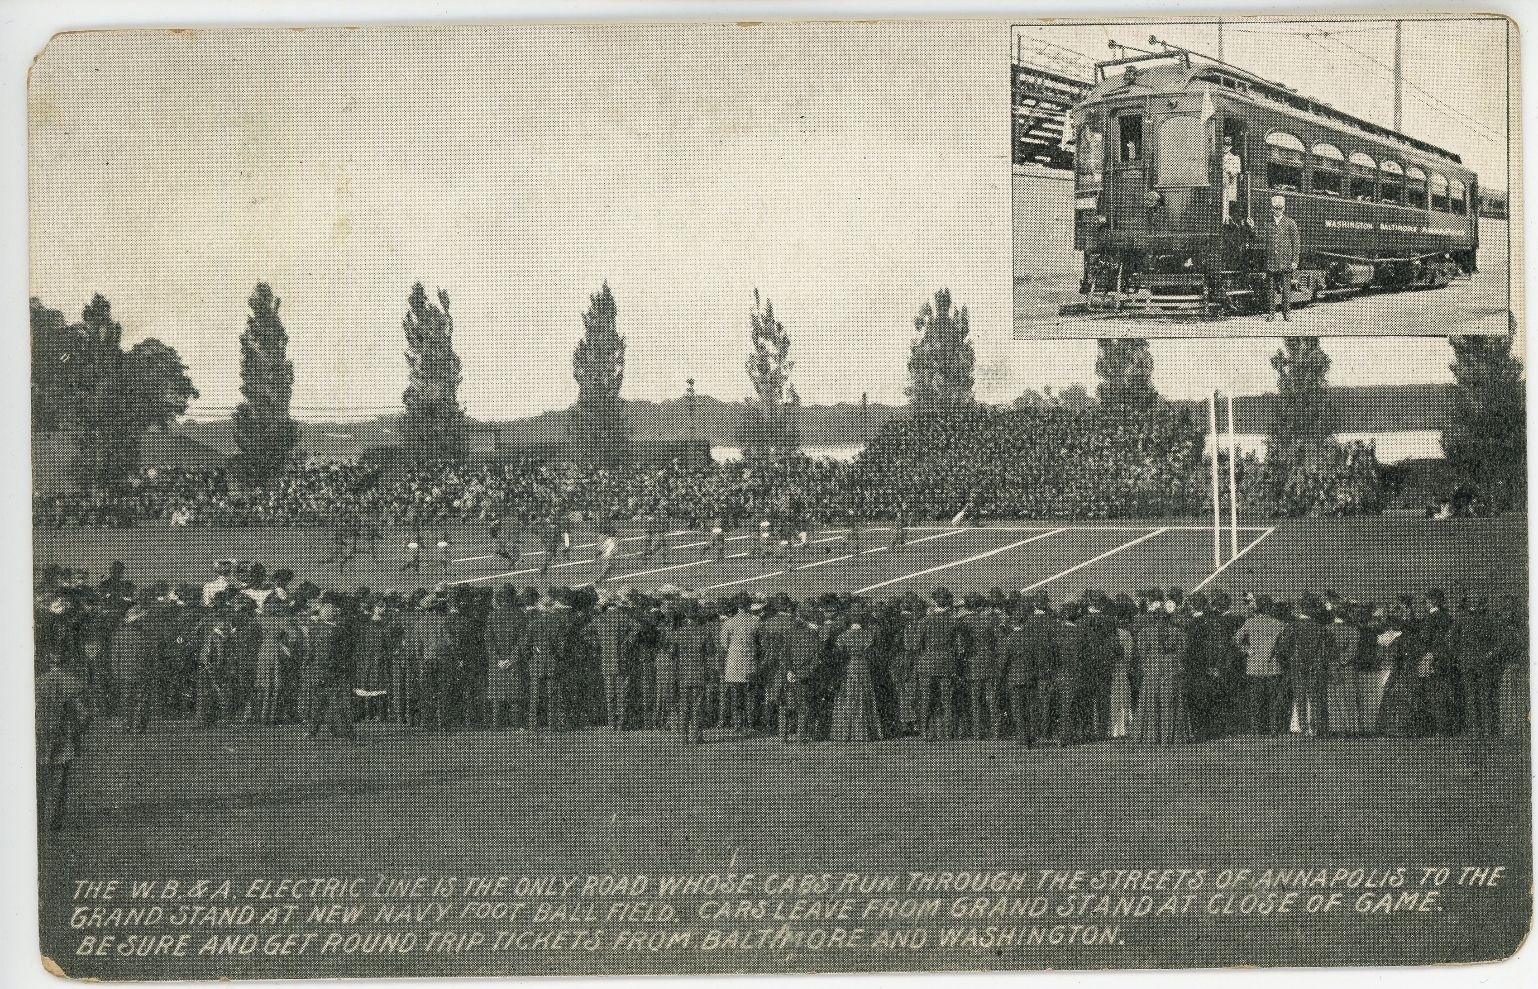 Washington-Baltimore-and-Annapolis-Railroad-Postcard-3-1.jpg